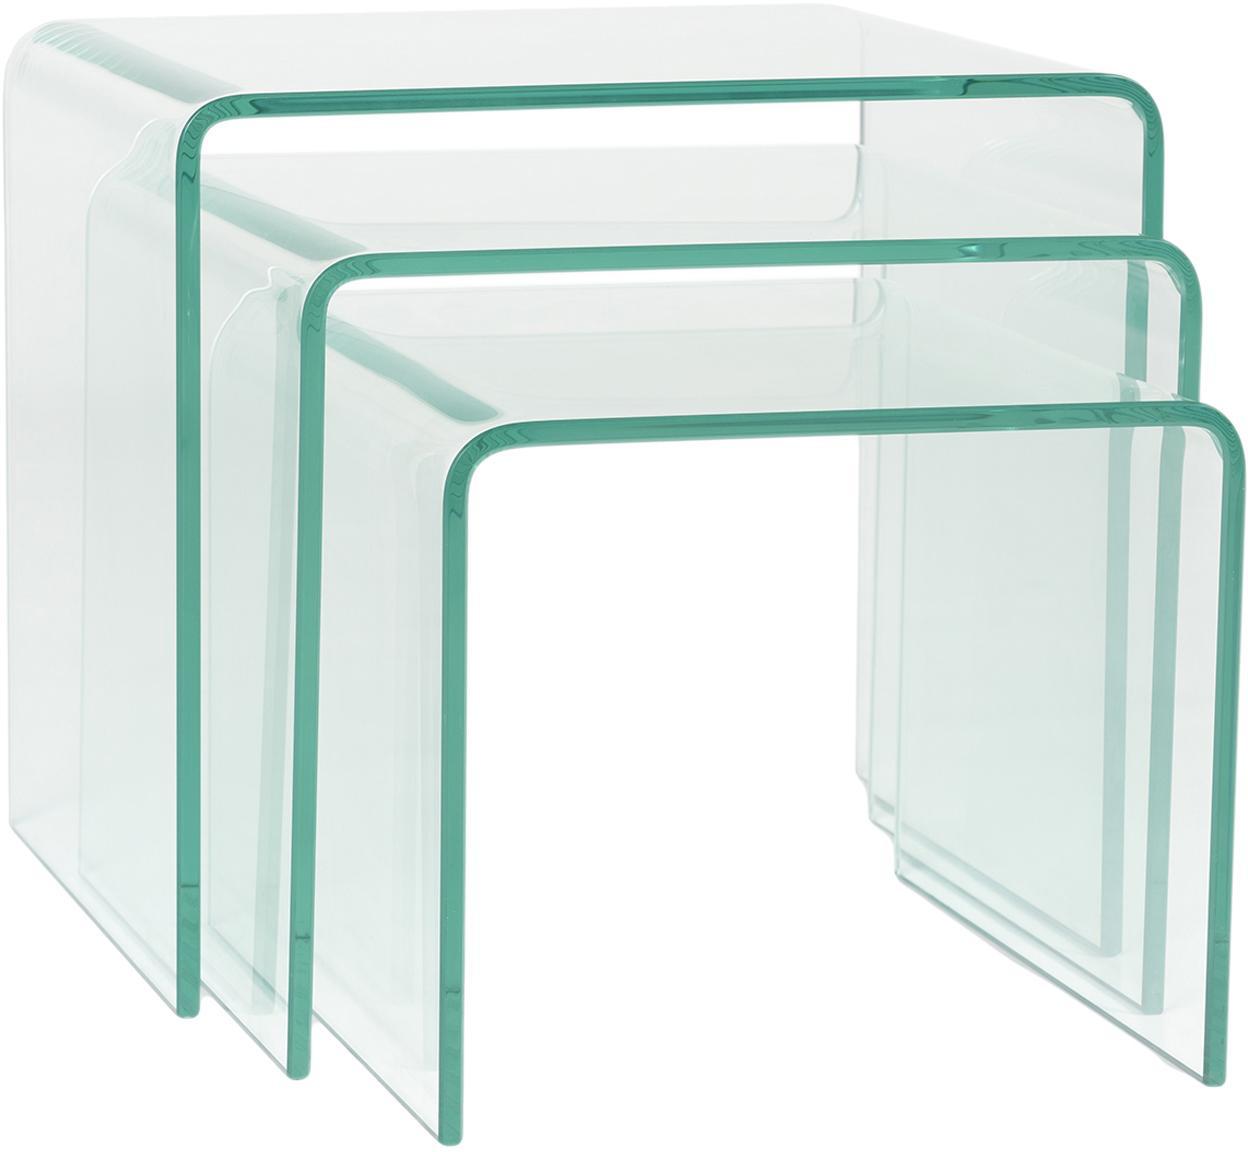 Set de mesas auxiliares Ringo, 3pzas., Vidrio templado, Transparente, Set de diferentes tamaños